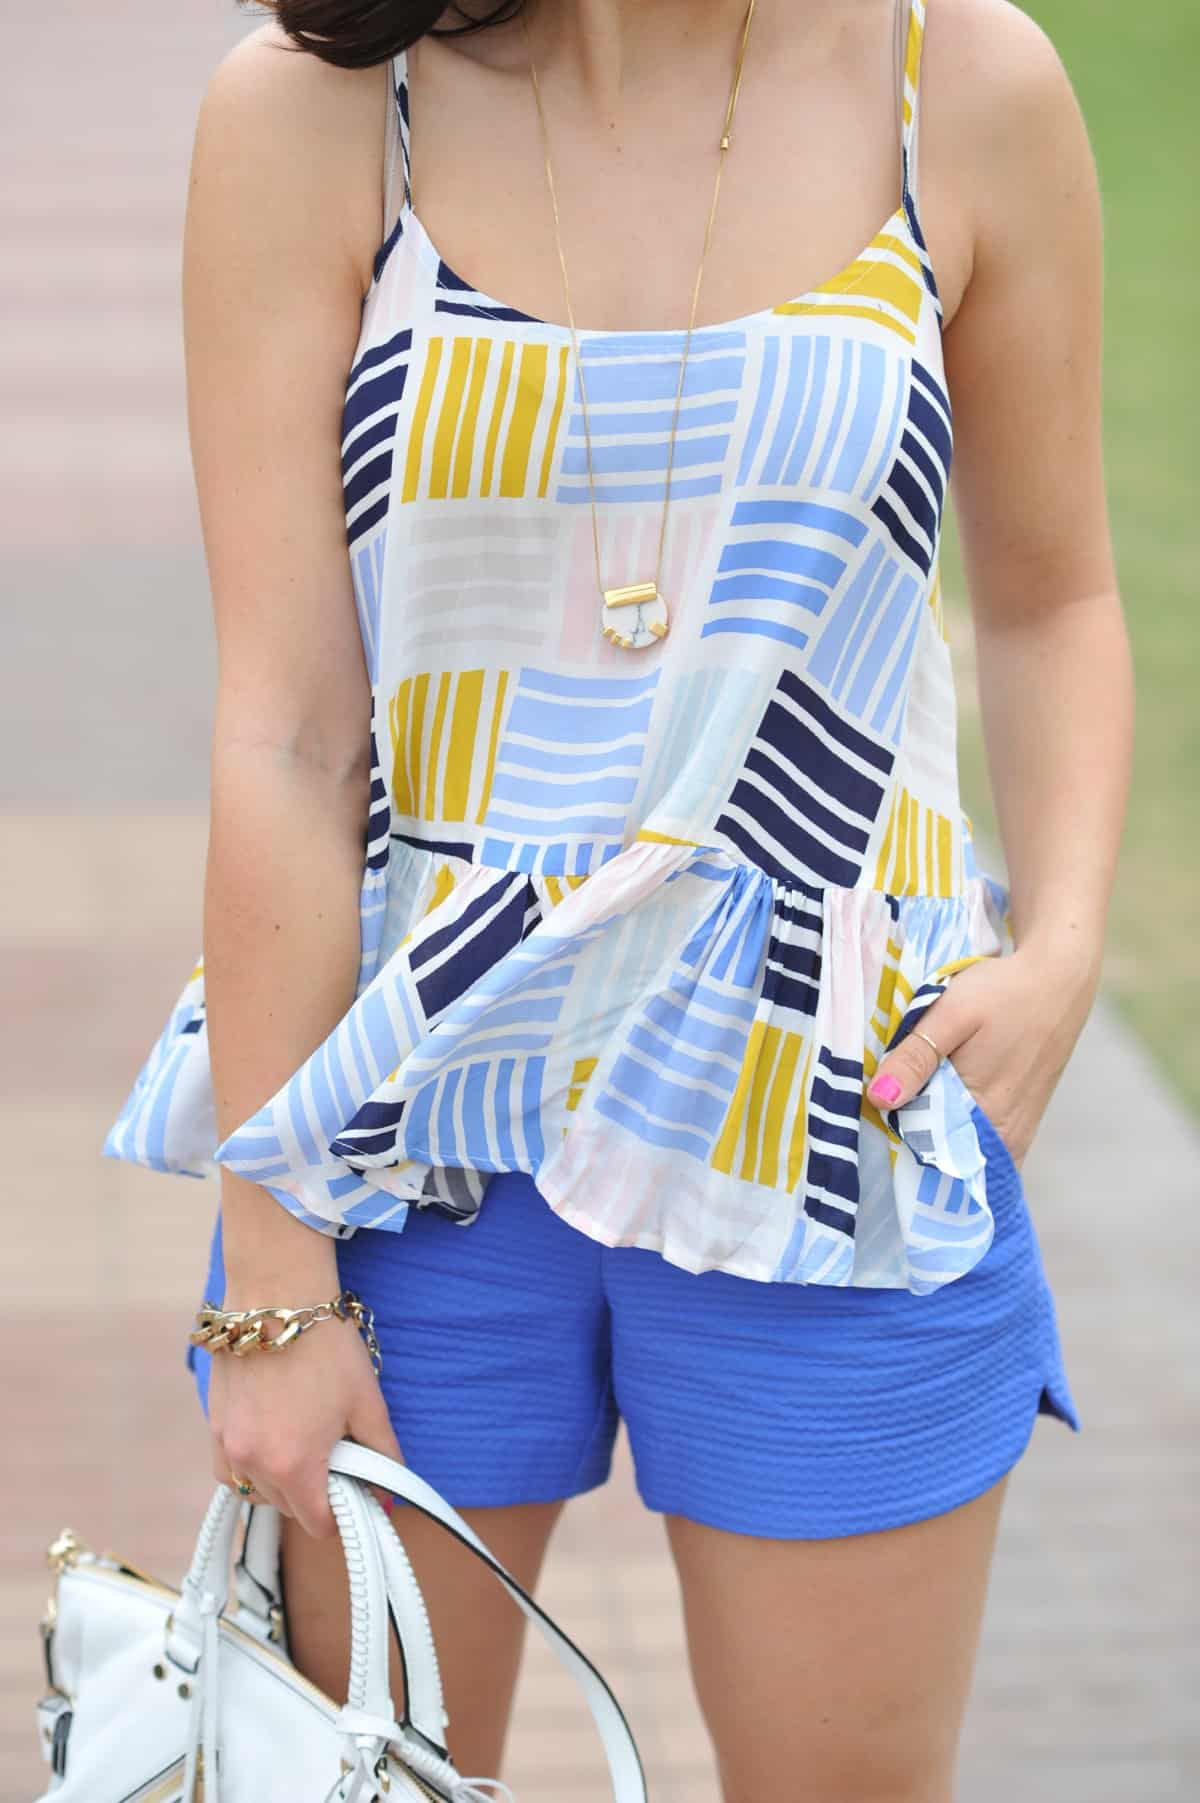 Old Navy printed peplum tank - summer outfit ideas - My Style Vita - @mystylevita - 19